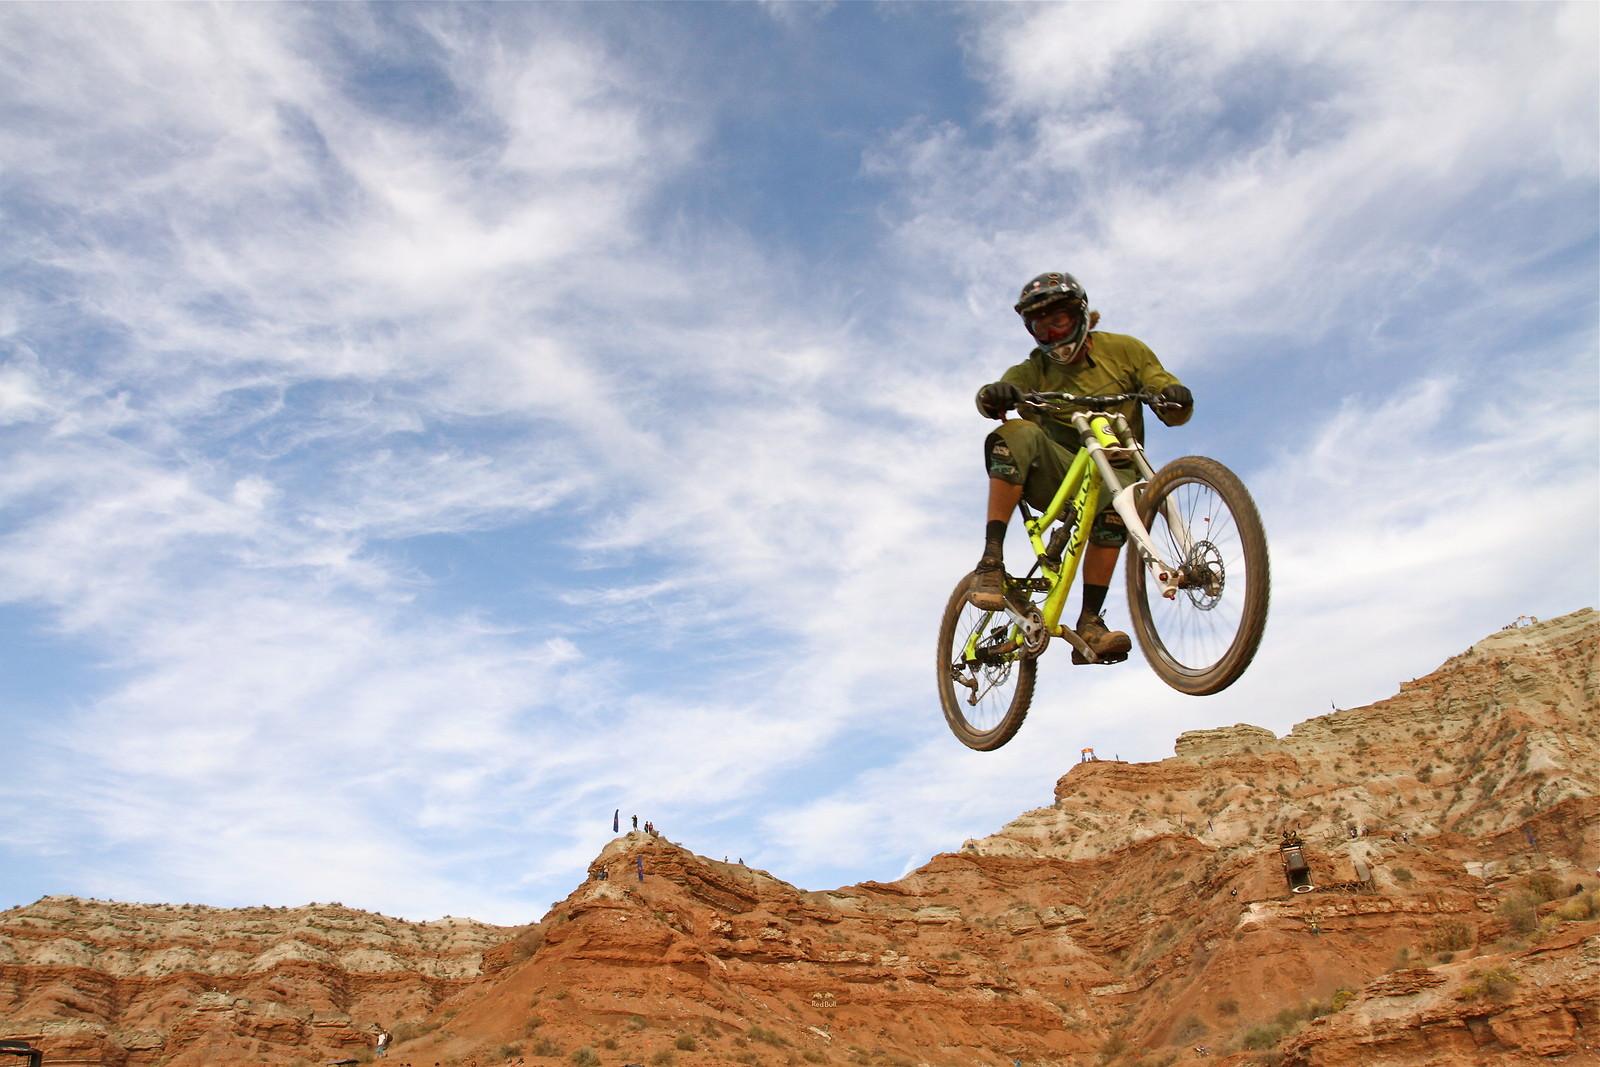 Garett Buehler - Malcolm Mclaws - Mountain Biking Pictures - Vital MTB